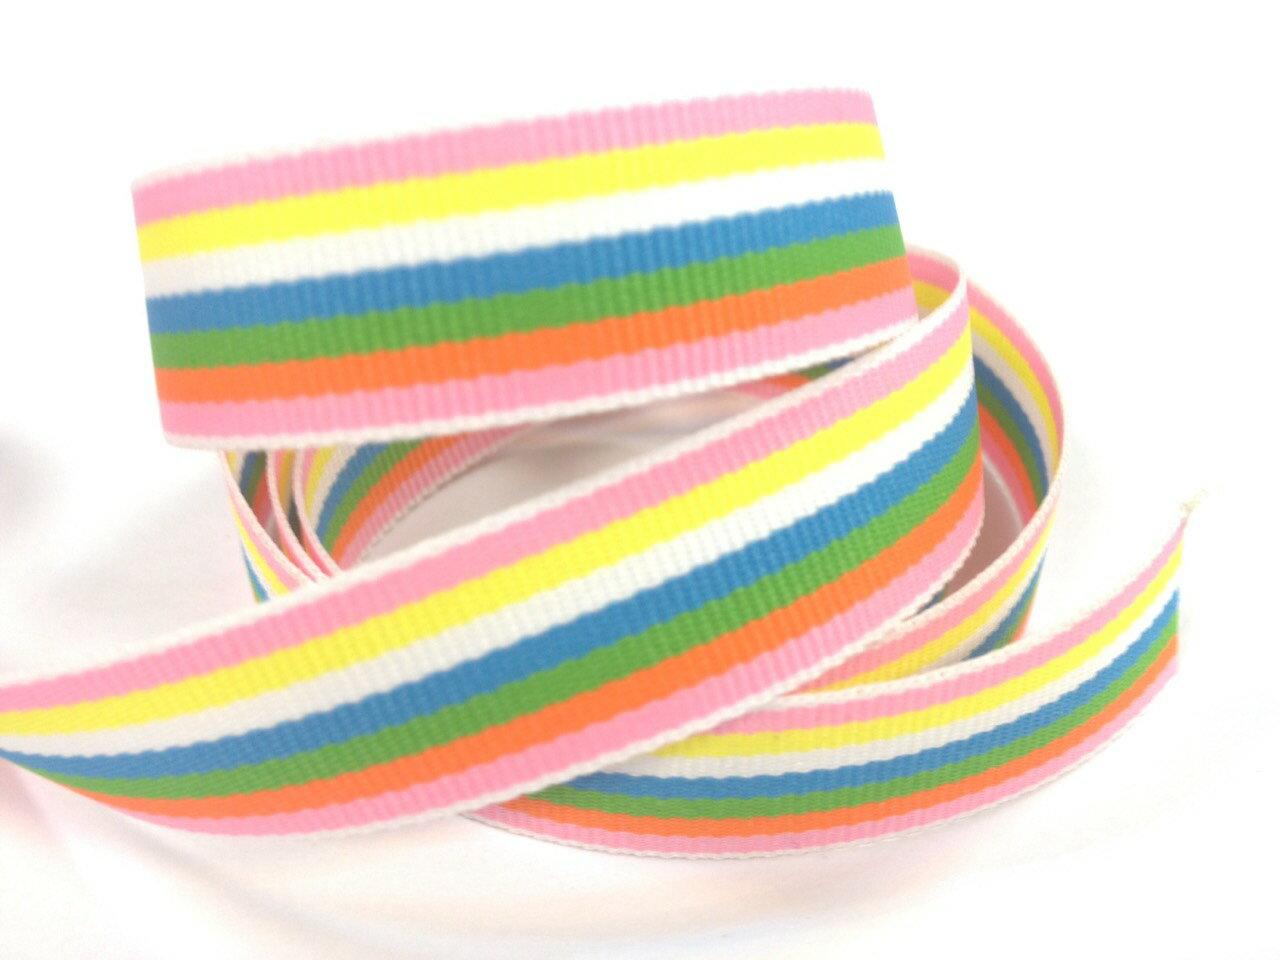 【Crystal Rose緞帶專賣店】彩虹平織帶 - 限時優惠好康折扣